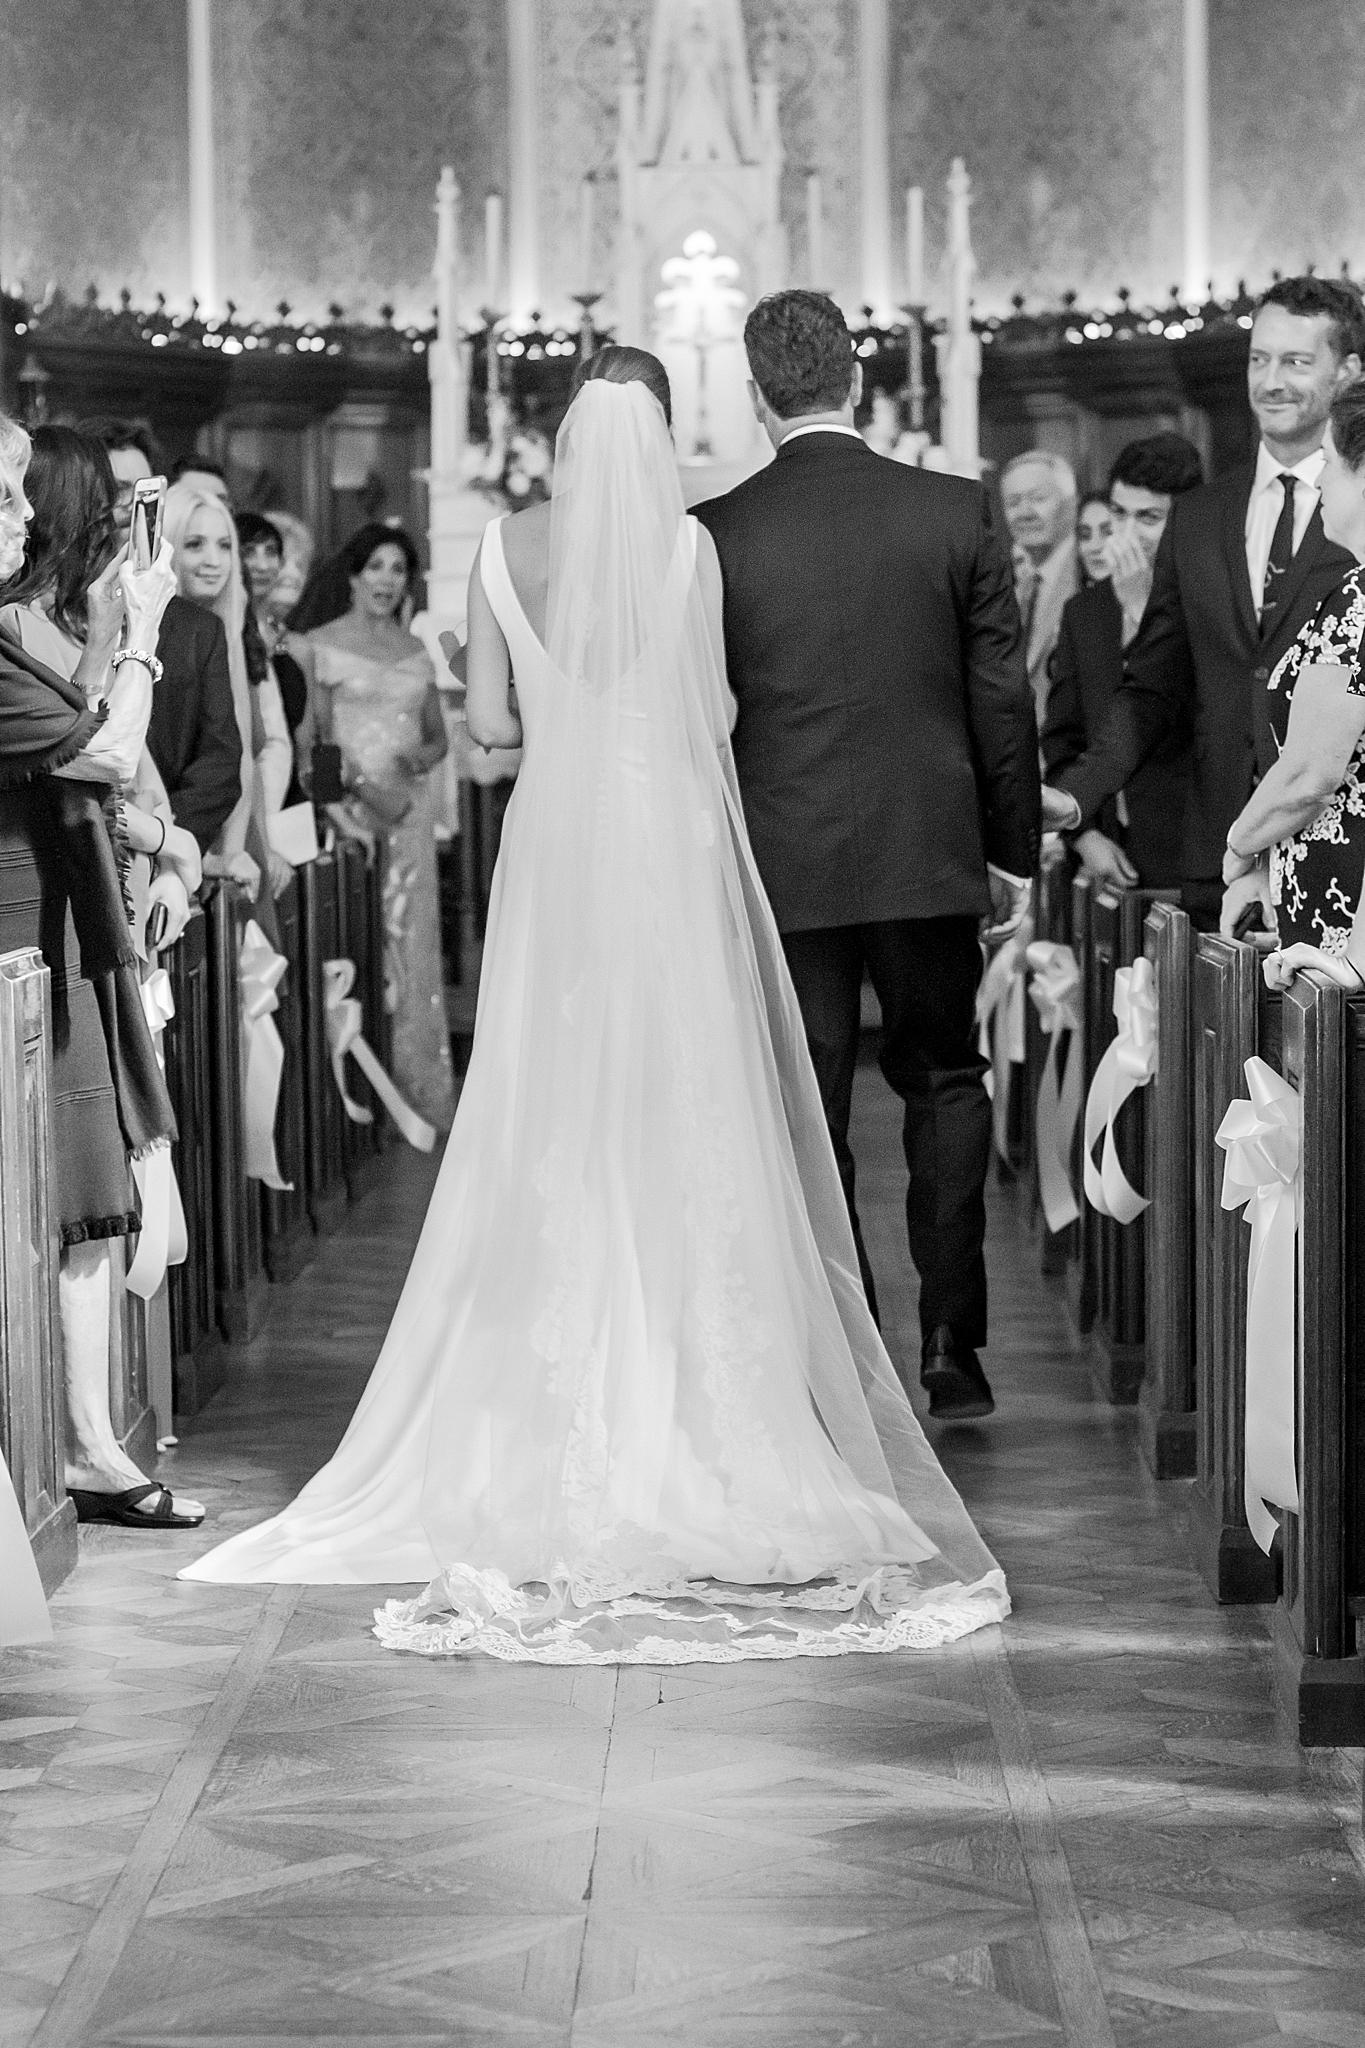 detroit-wedding-photographer-grosse-pointe-academy-chapel-detroit-golf-club-wedding-carly-matt-by-courtney-carolyn-photography_0036.jpg